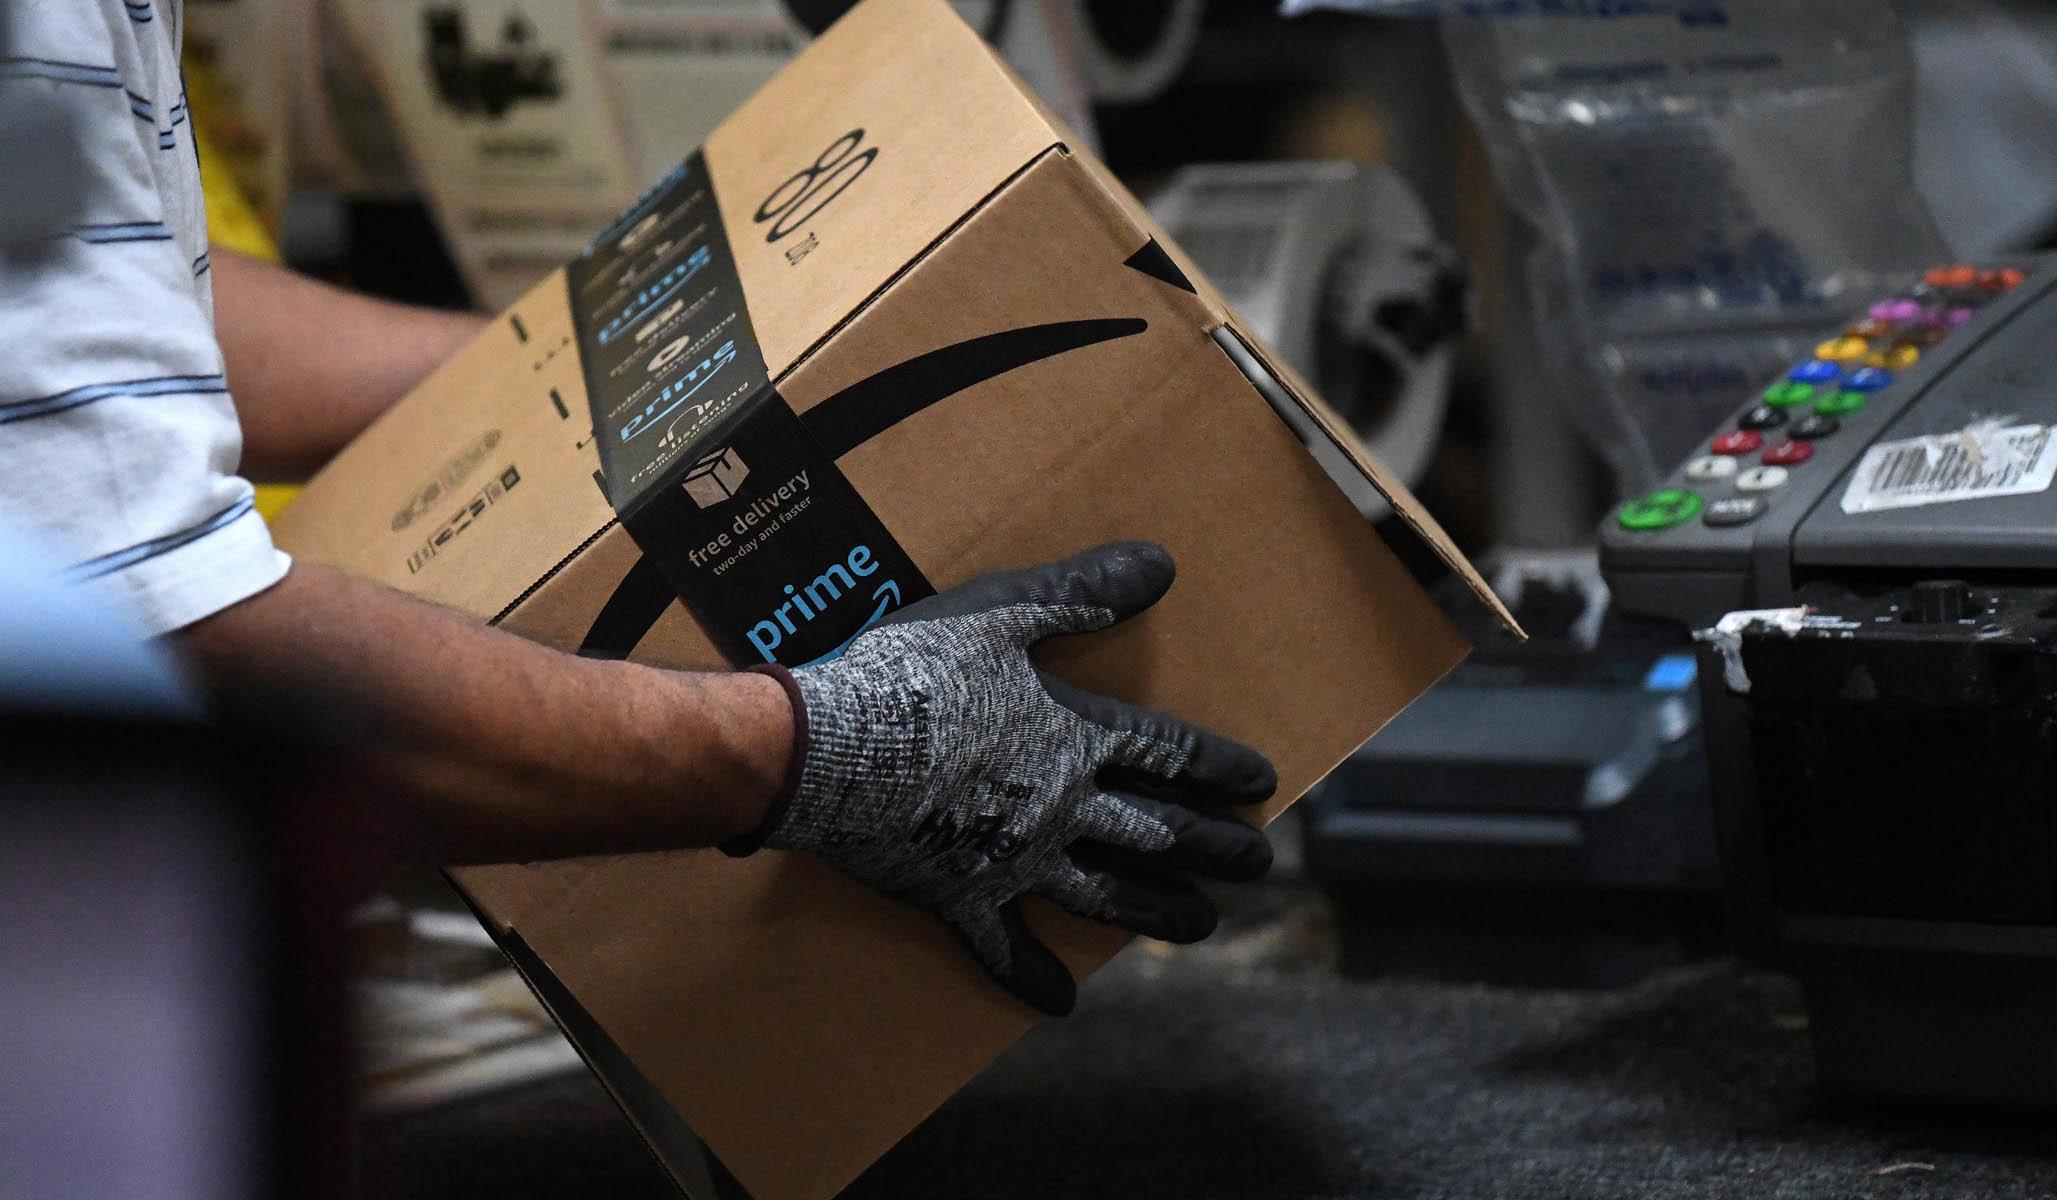 New Antitrust Bills — Anti-Consumer, Anti-Enterprise, and Anti-Innovation